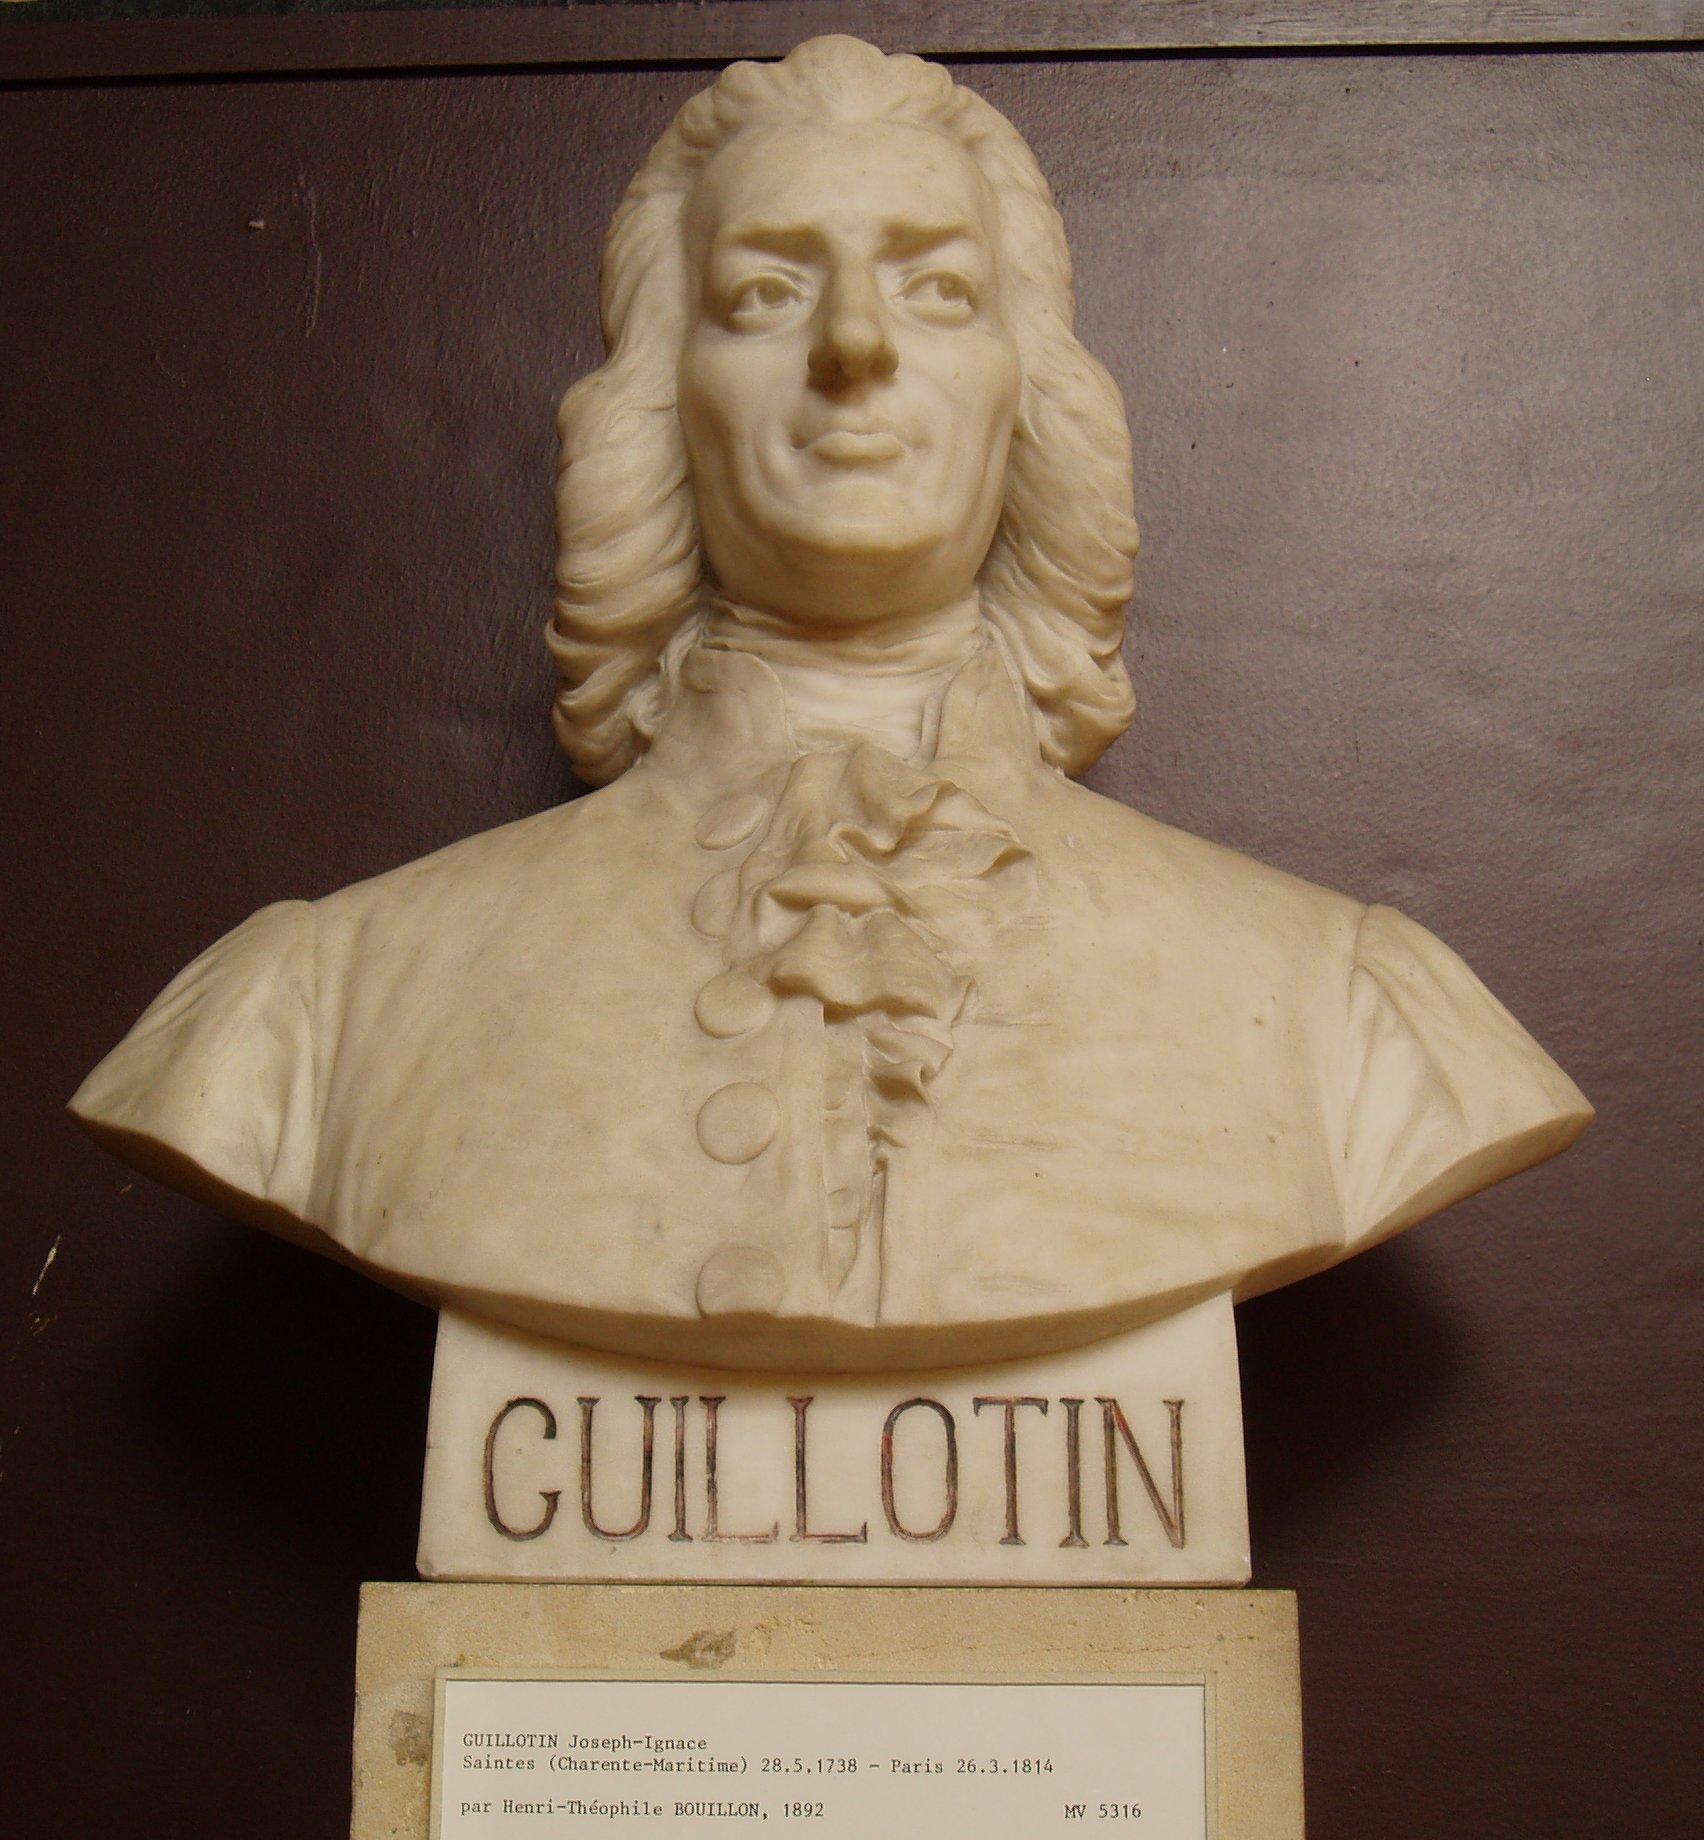 Photo of a bust of Joseph Ignace Guillotin